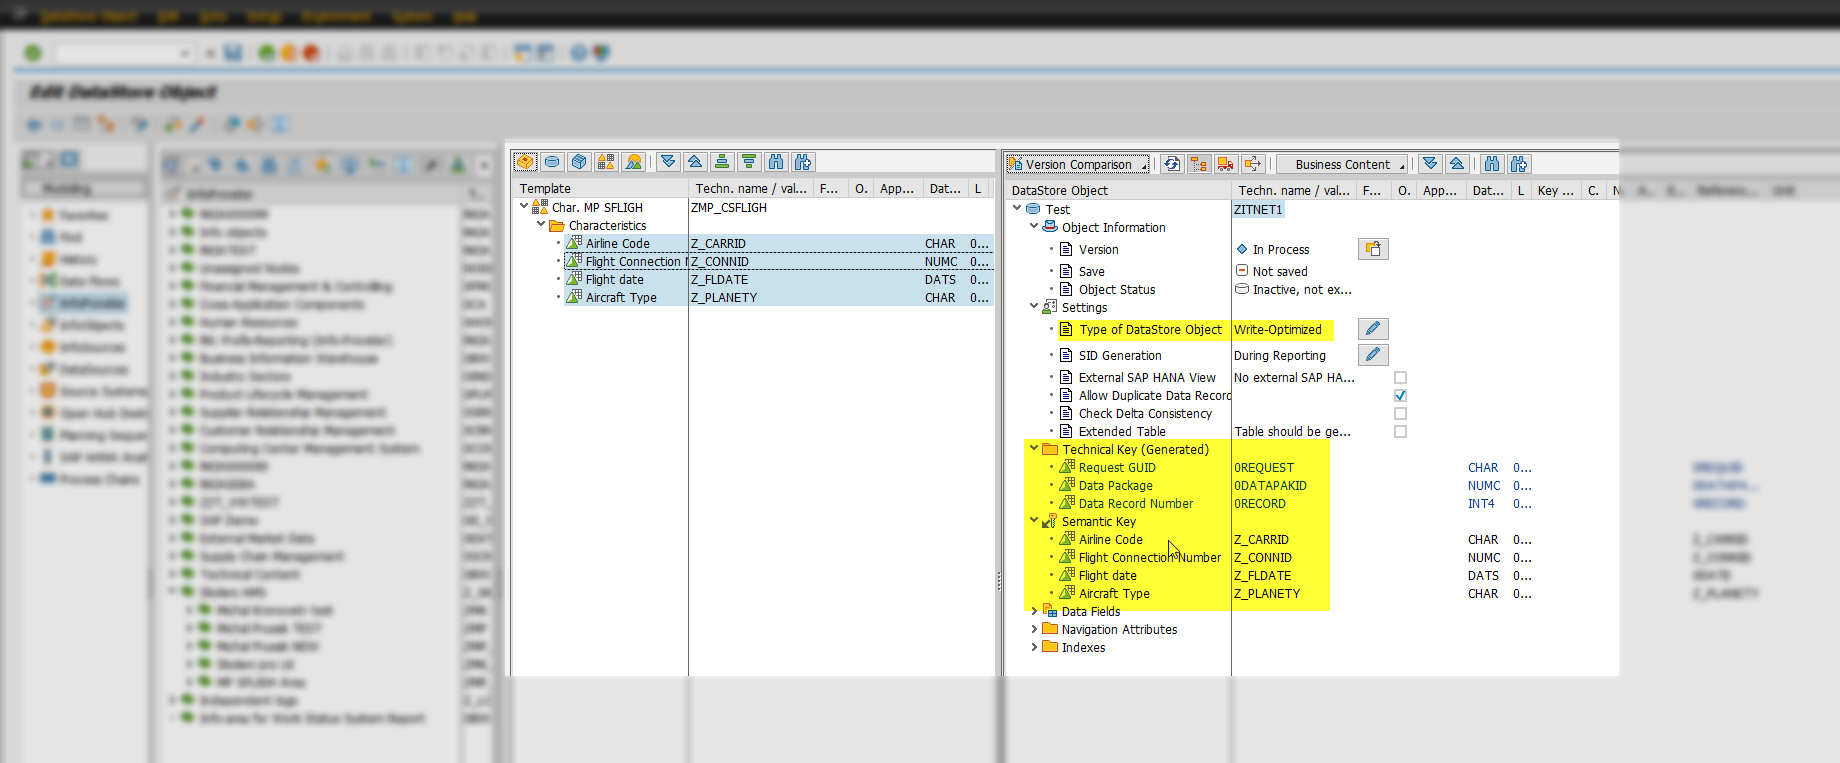 Lekce 5 - Data Store Object (DSO) v SAP